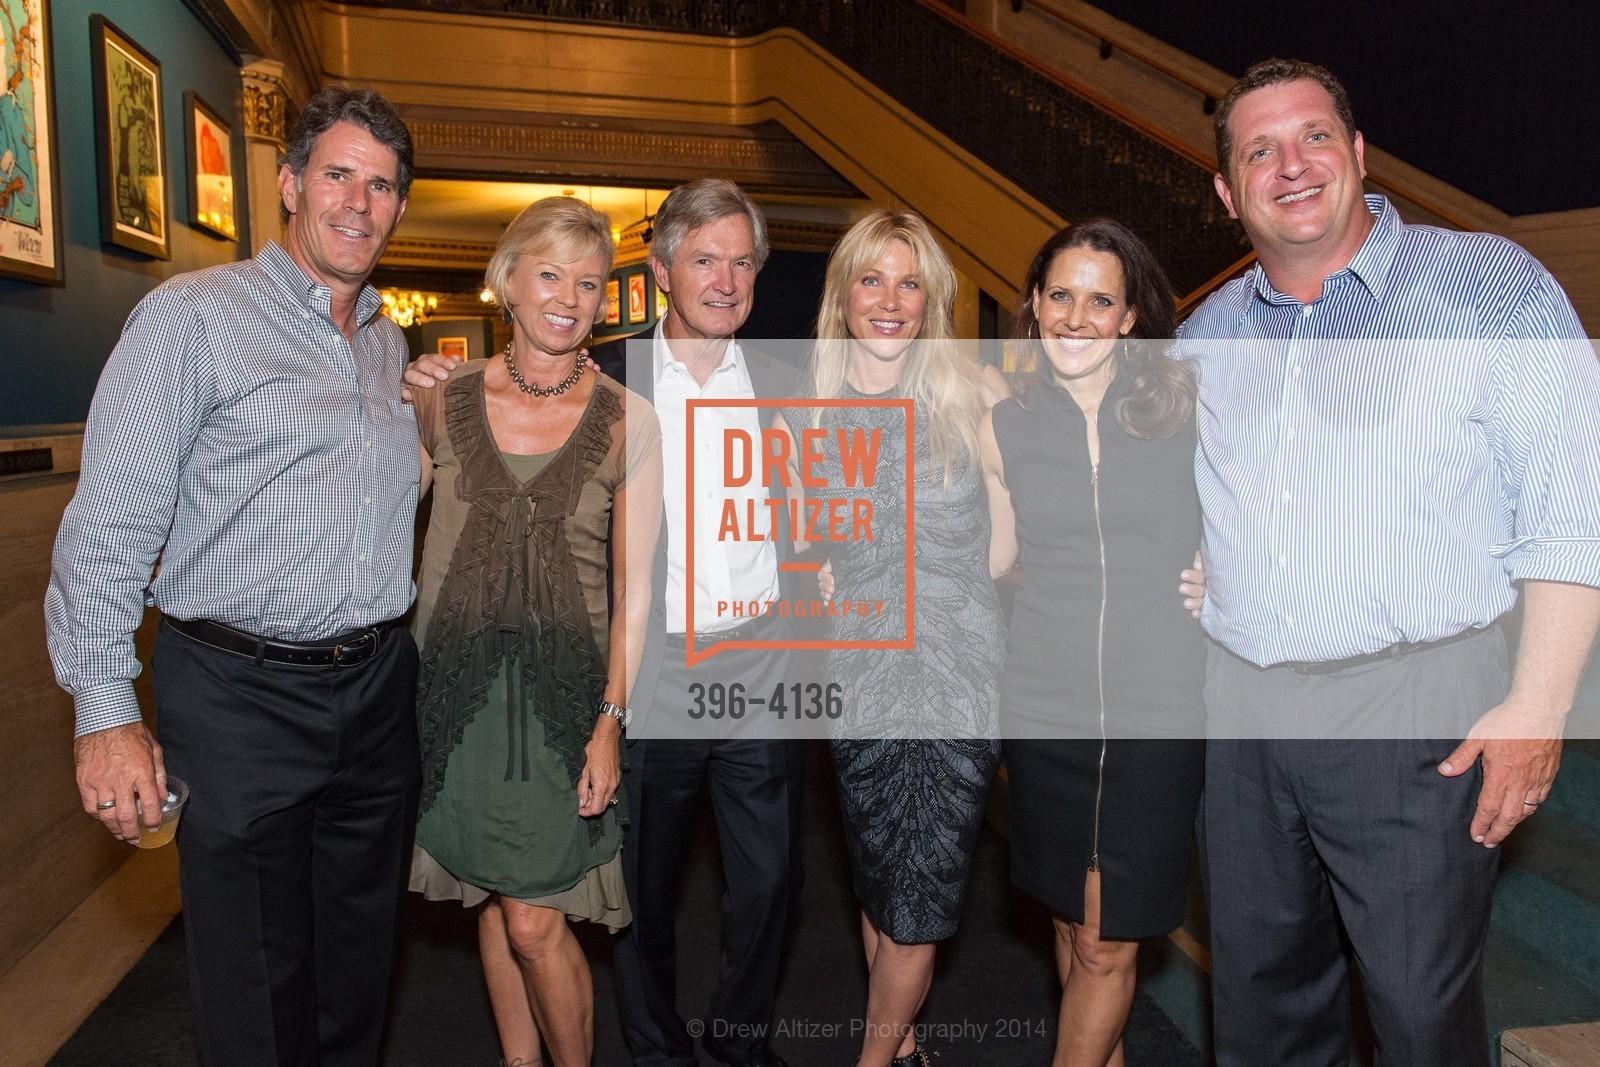 Steve Bono, Tina Bono, Victoria Stewman, Megan Barton, Harris Barton, Photo #396-4136